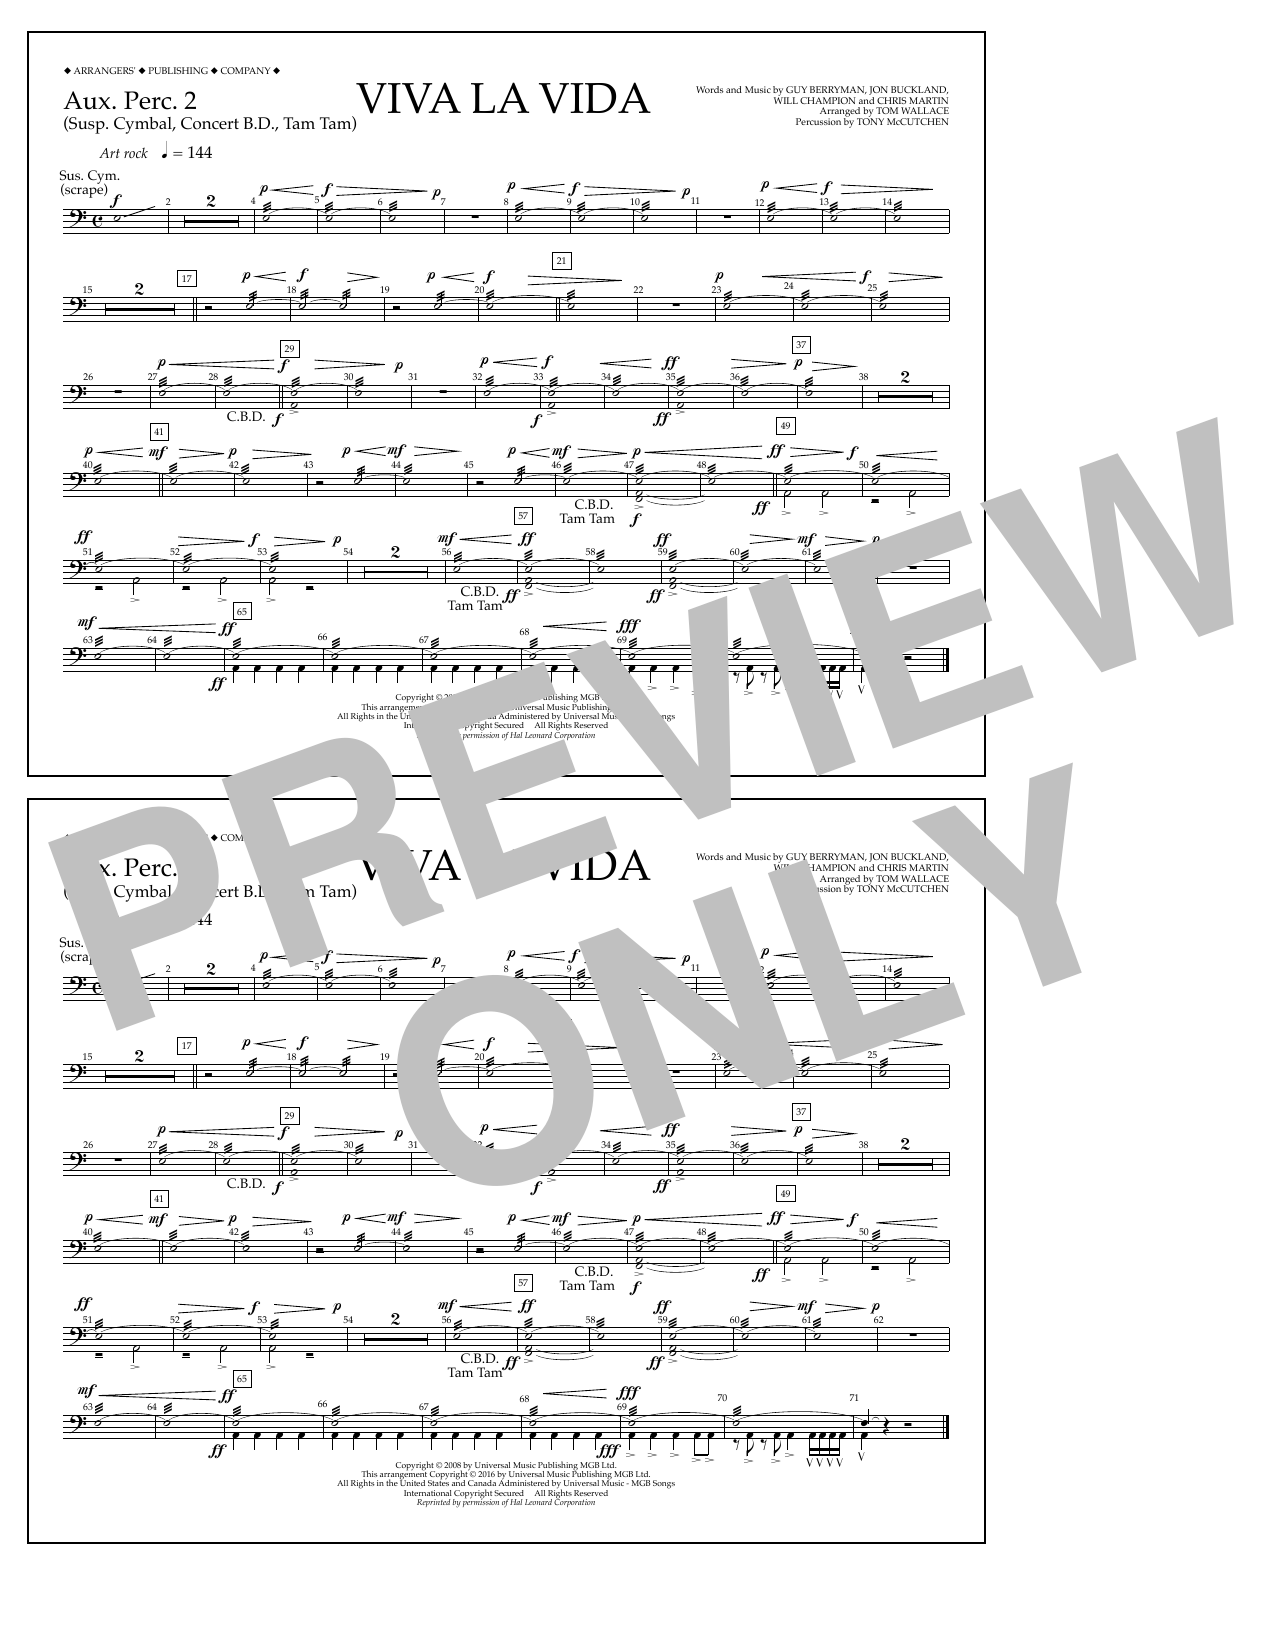 Tom Wallace Viva La Vida - Aux. Perc. 2 sheet music notes and chords. Download Printable PDF.